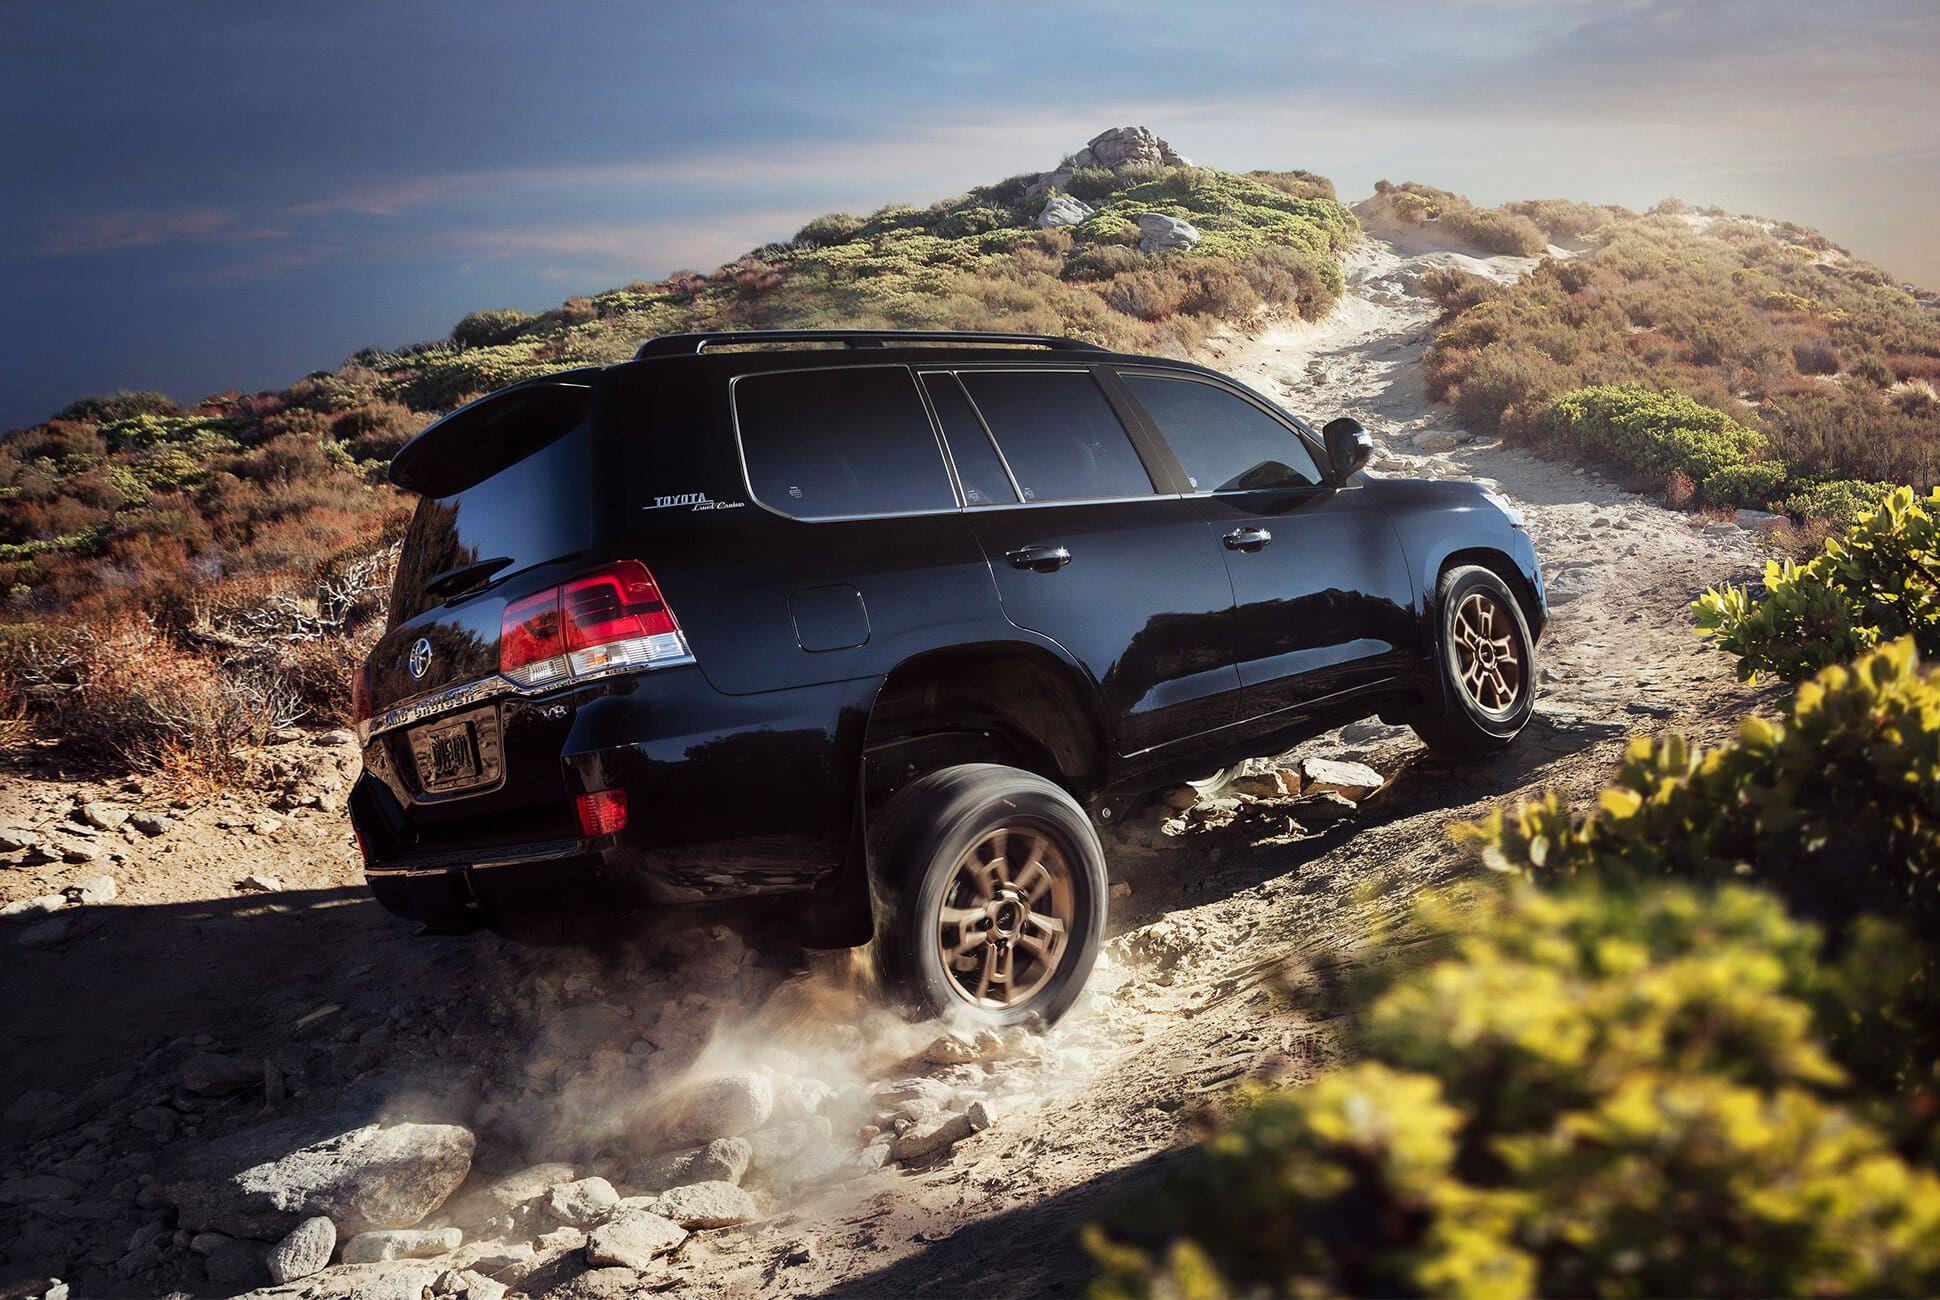 Toyota-Land-Cruiser-Heritage-Edition-gear-patrol-slide-6